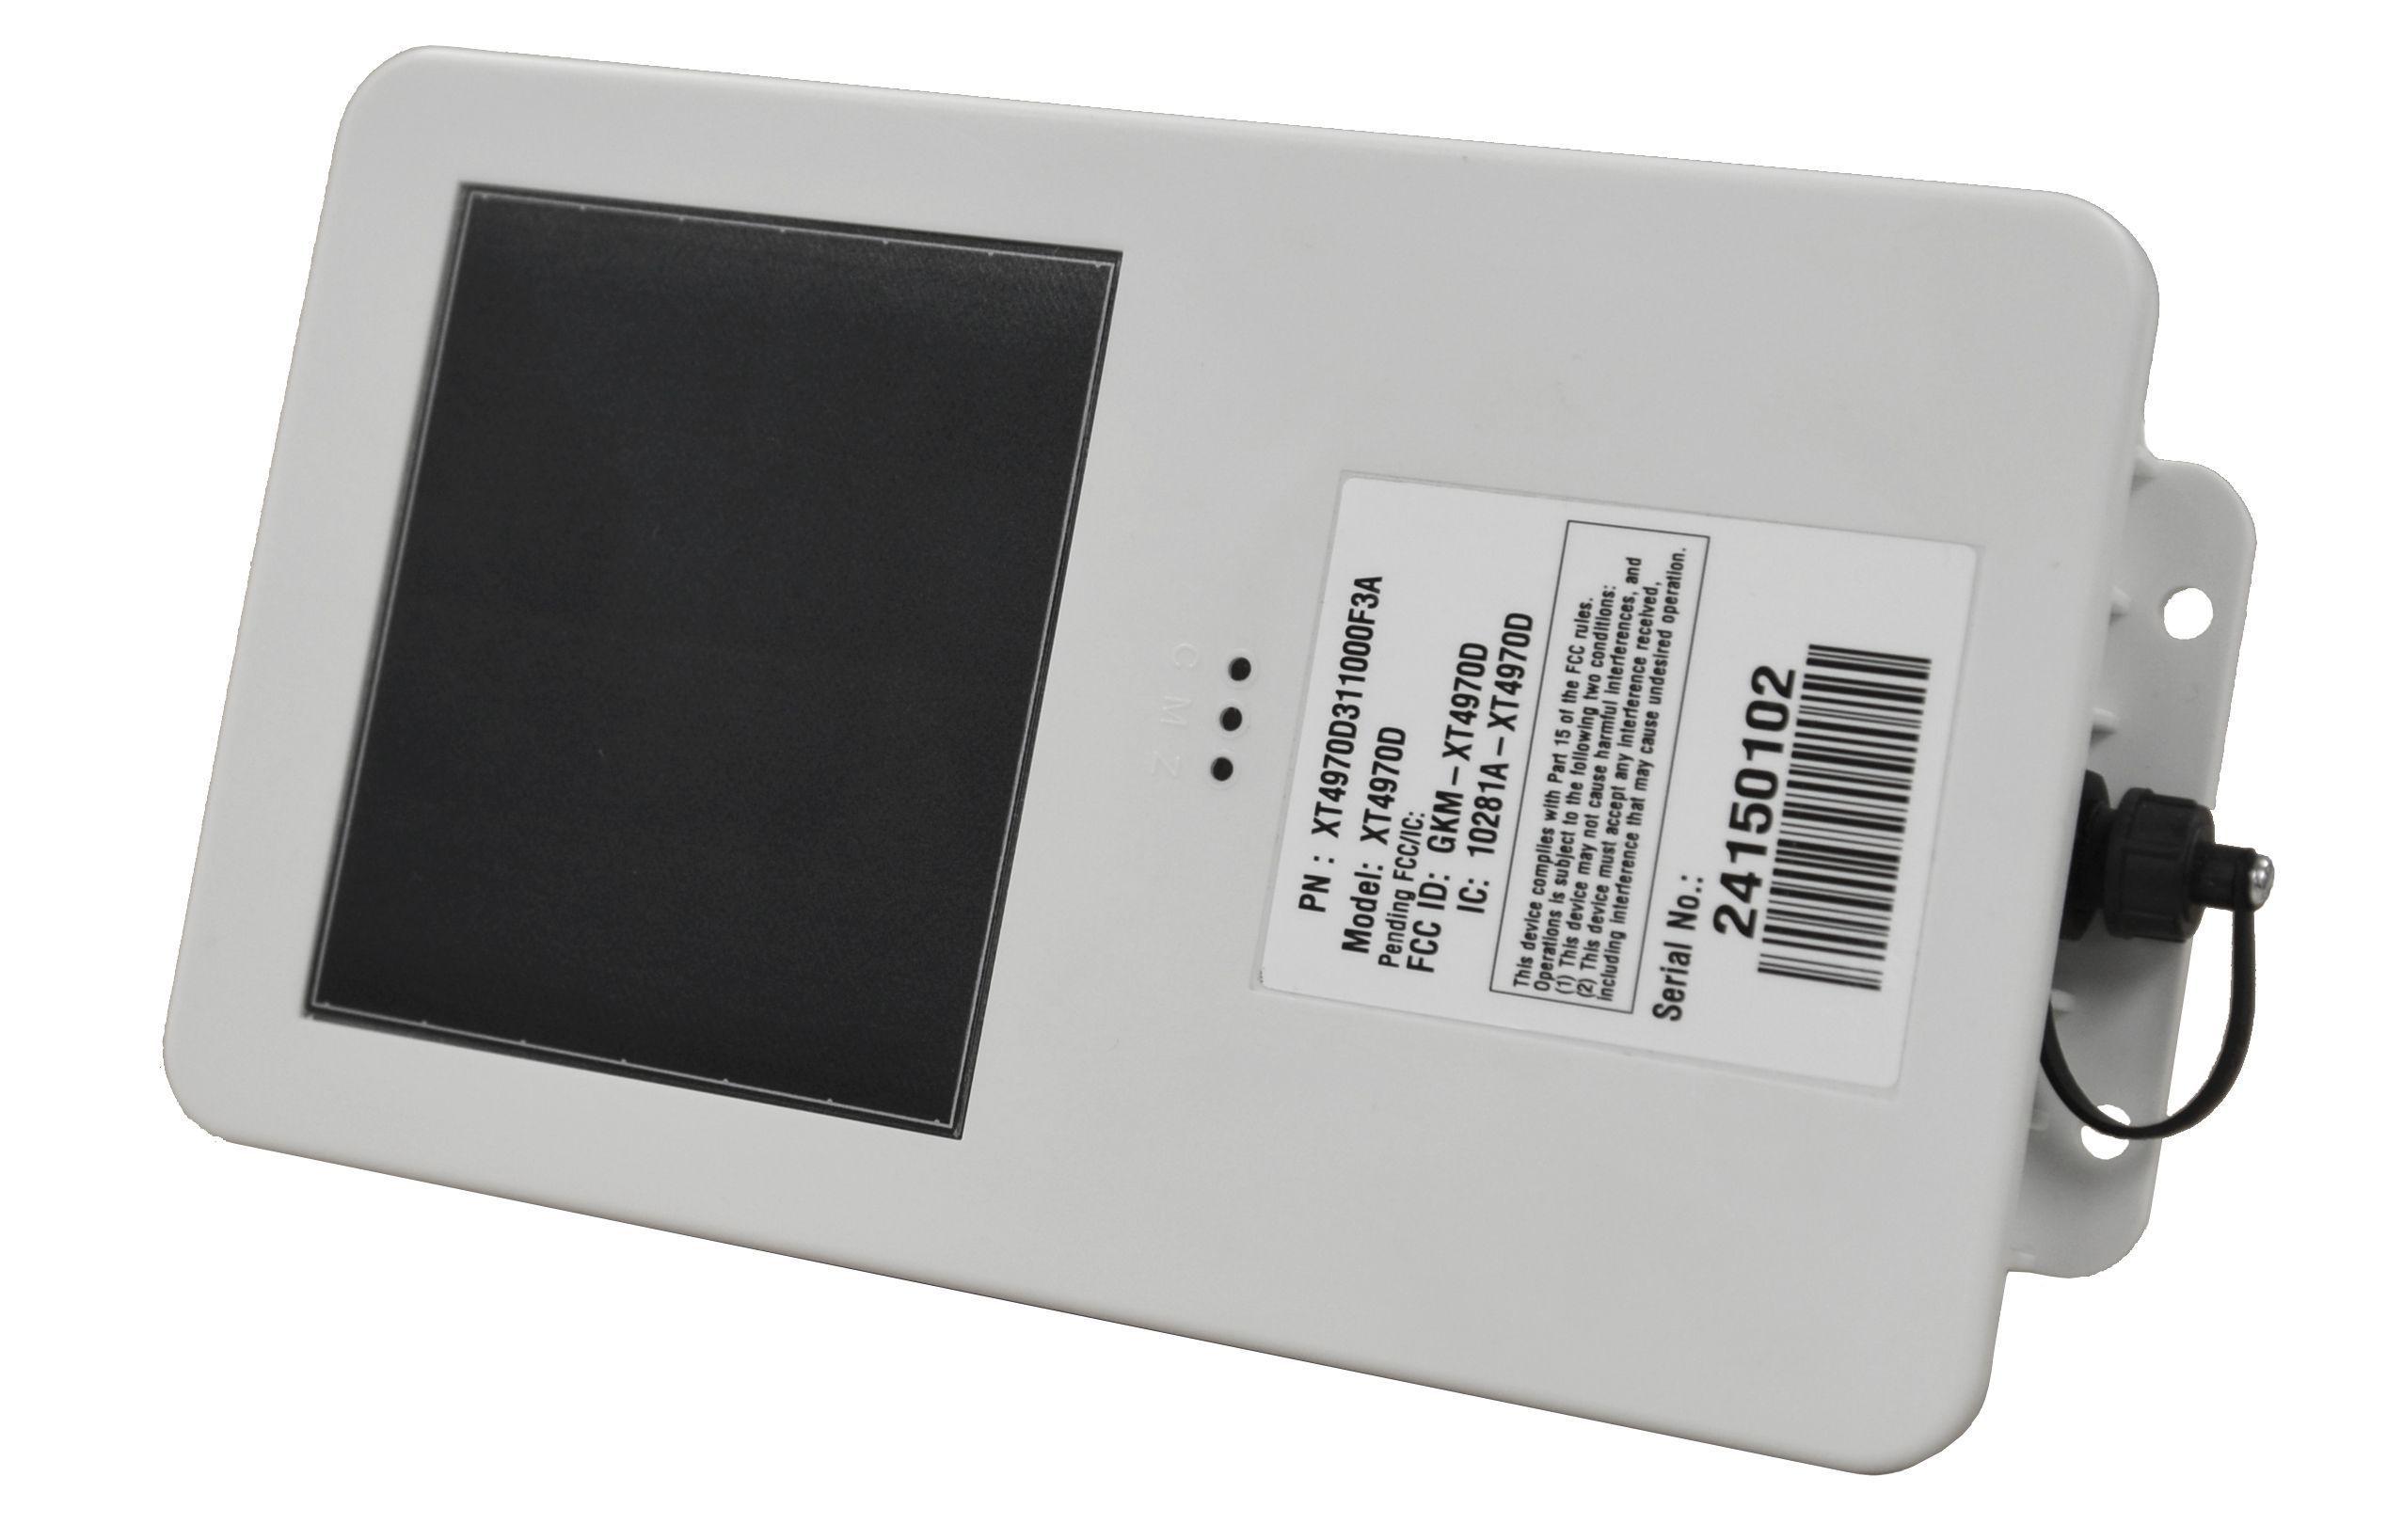 XT-4970